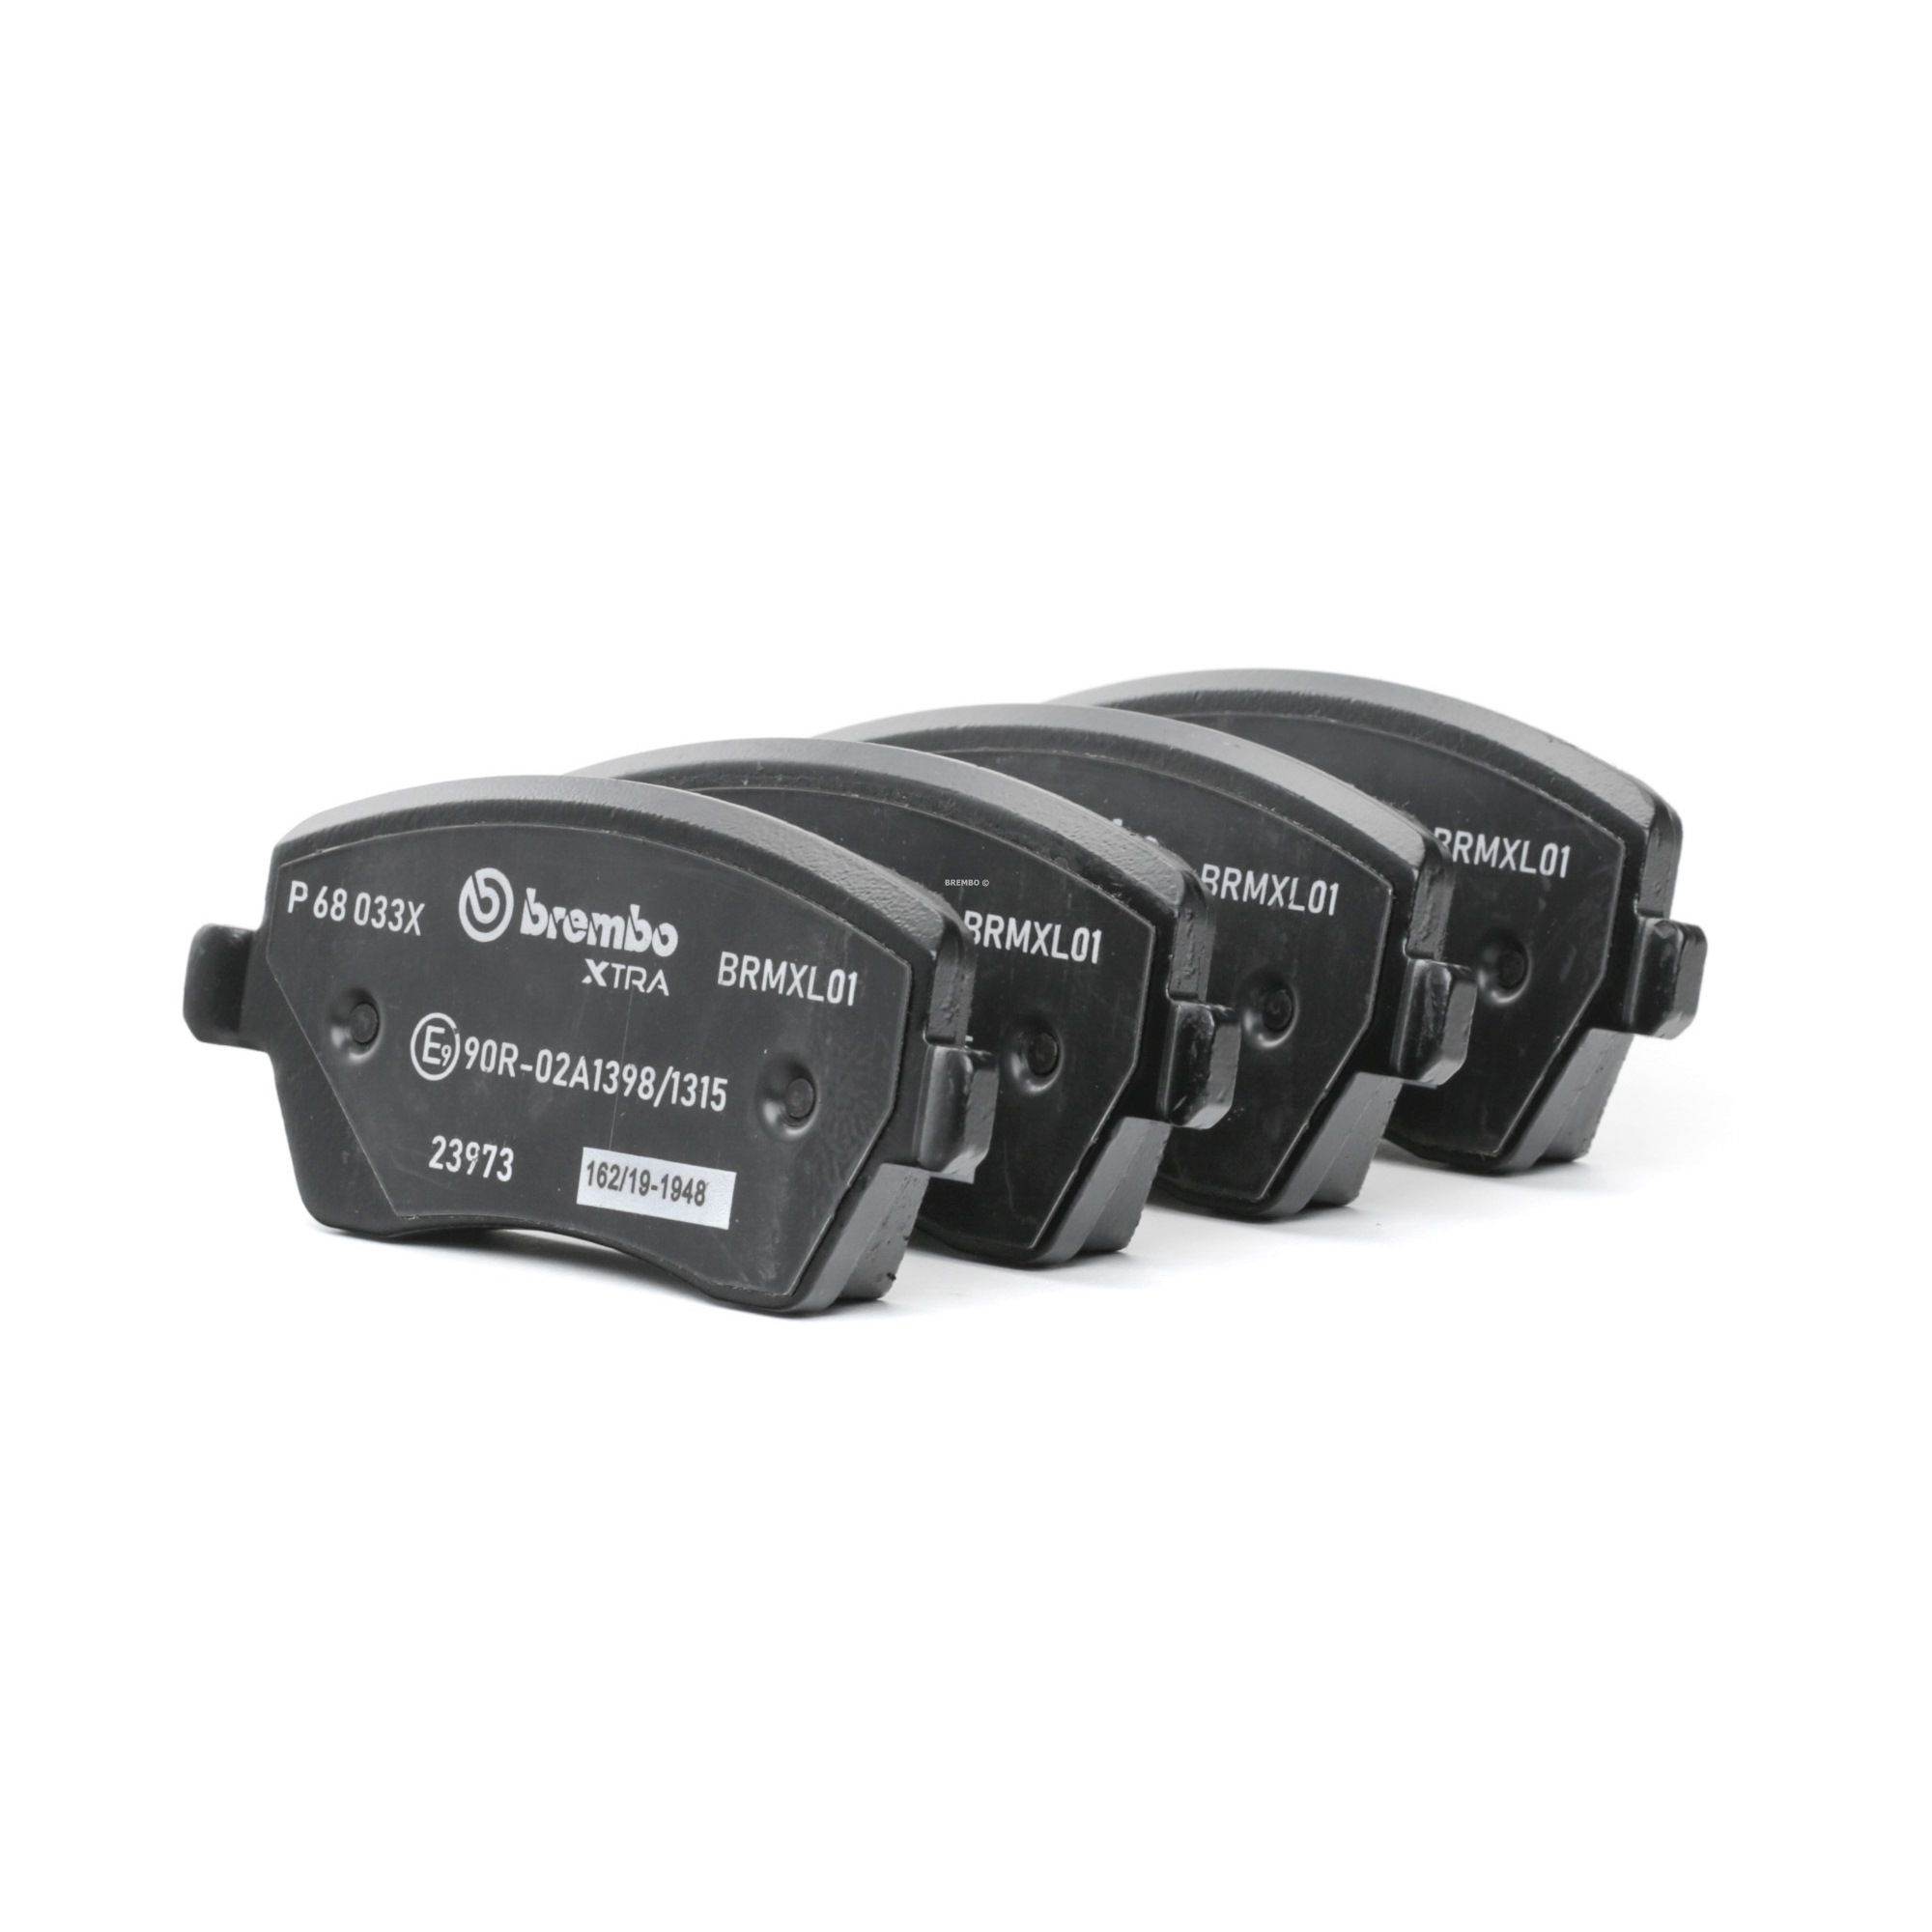 Bremsbelagsatz BREMBO 23973 Bewertung